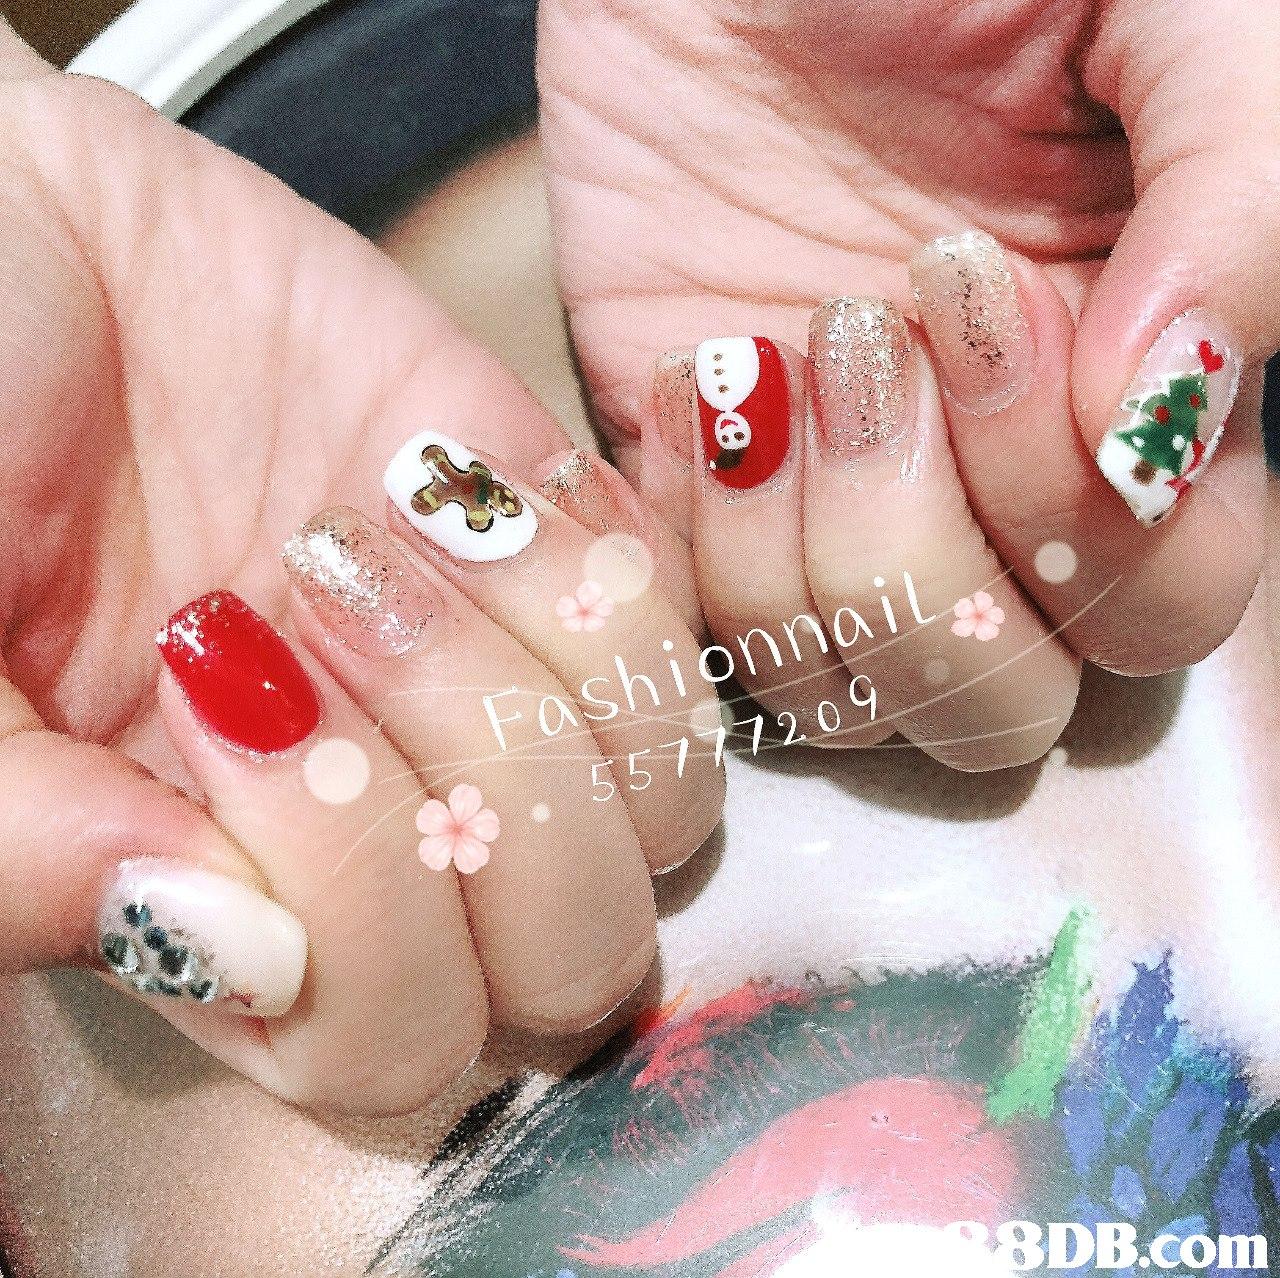 Fashiennail DB.com  Nail polish,Nail,Manicure,Nail care,Finger